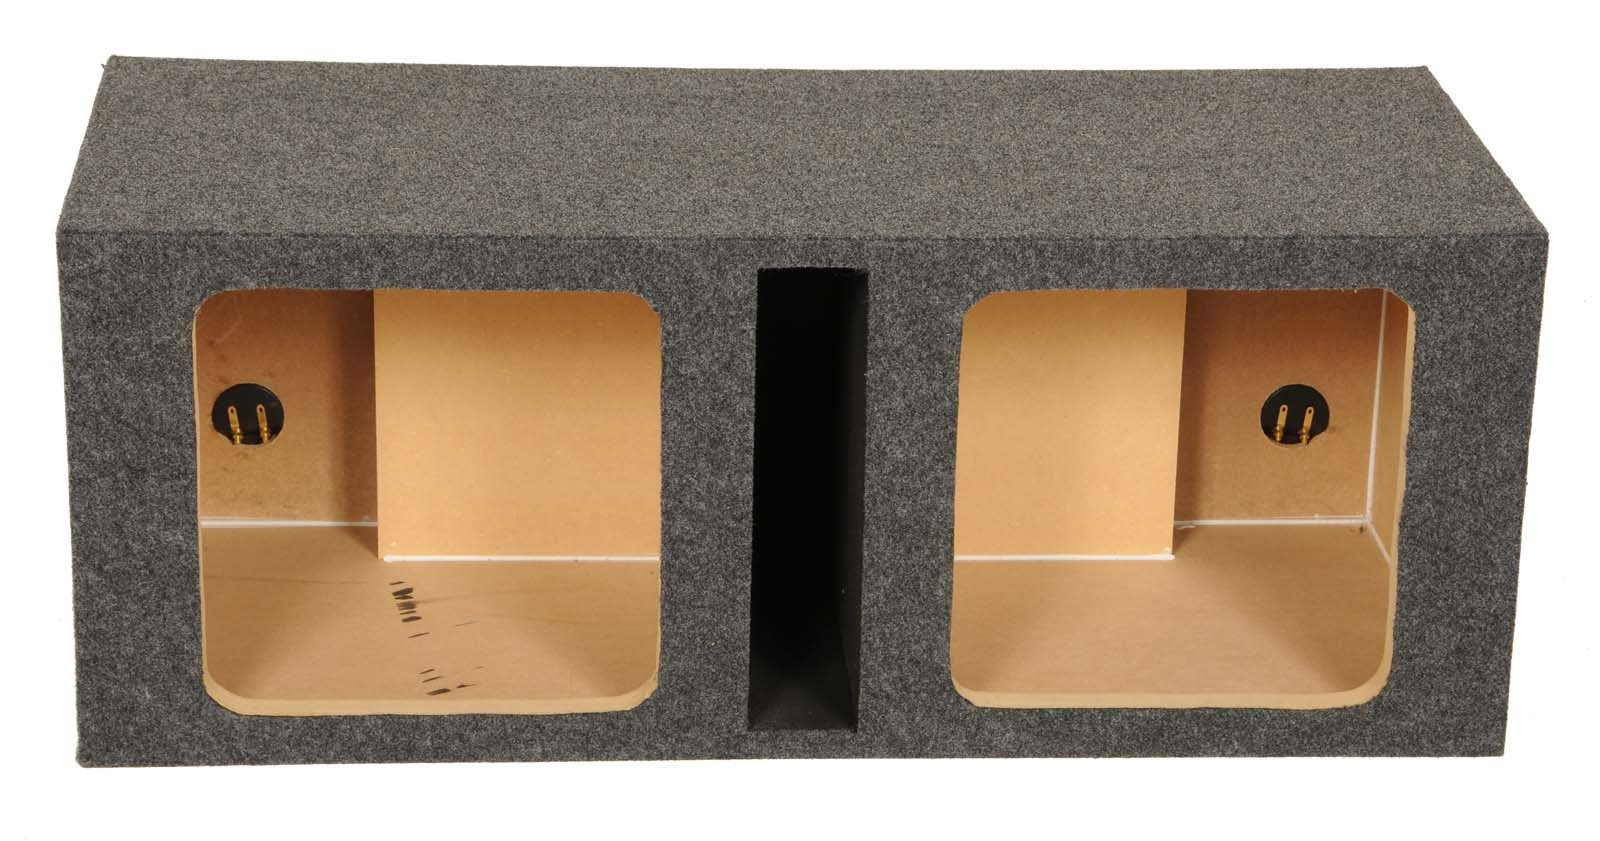 Q Power HD212 VENT SQ Dual 12-Inch Vented Custom Speaker Box for Kicker L7 Subwoofer